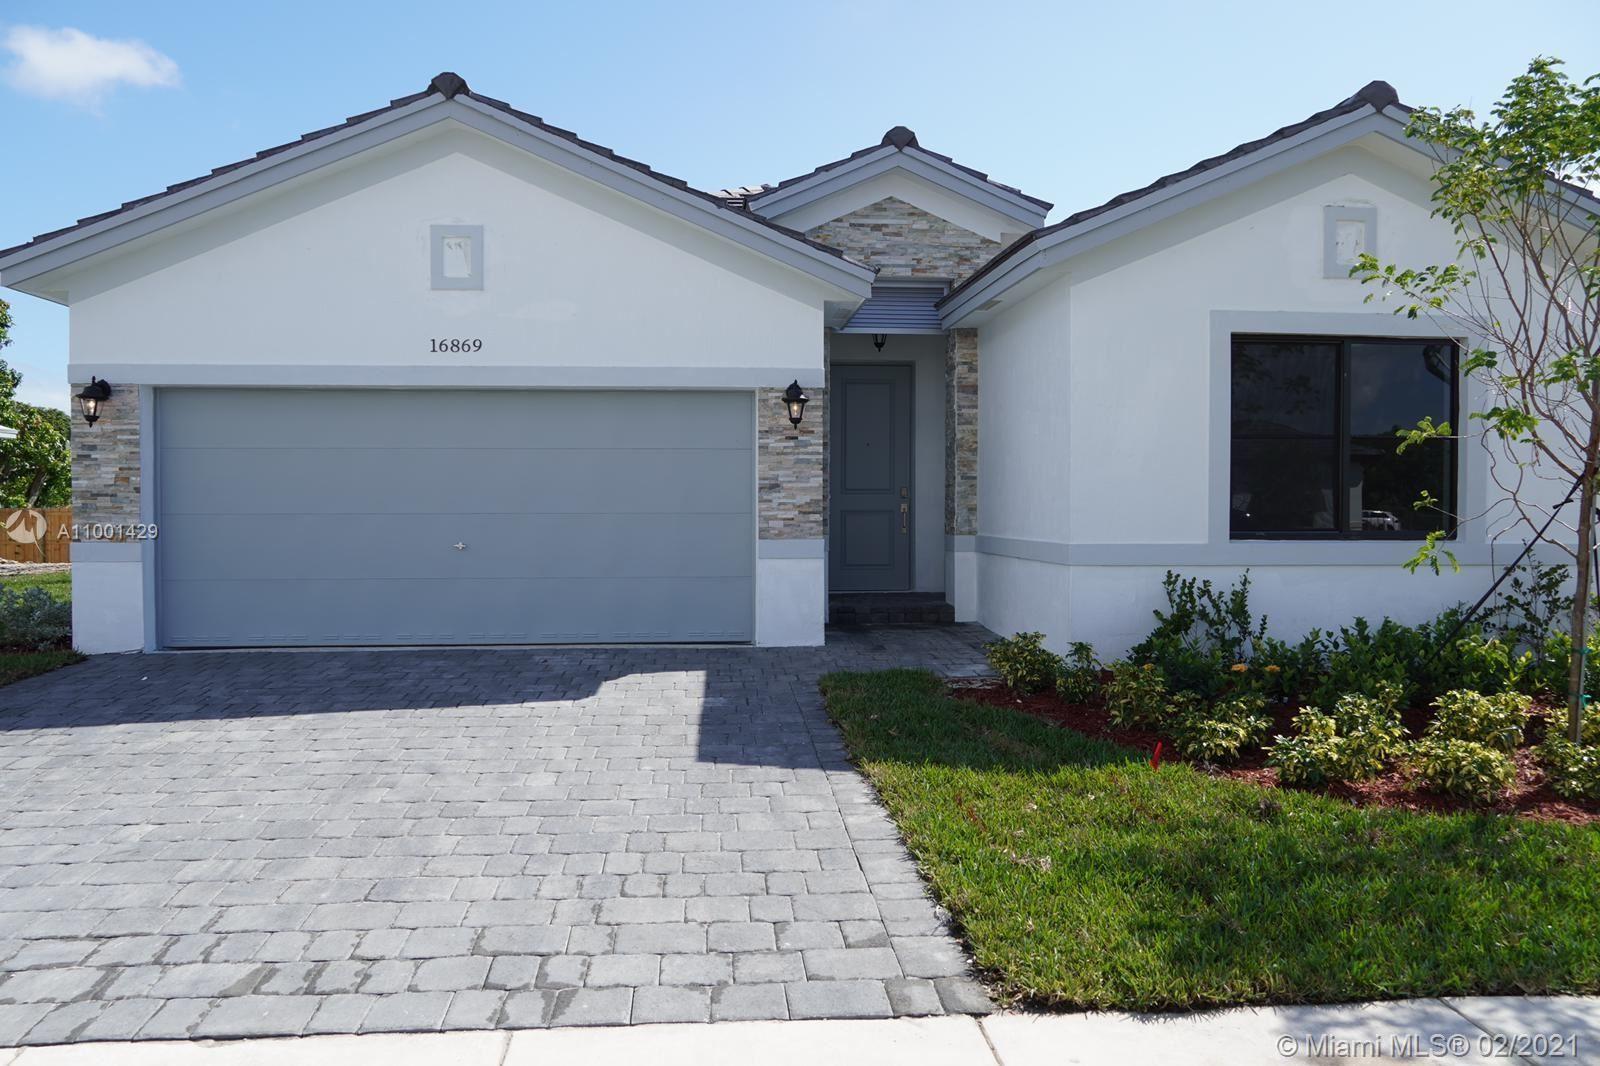 18918 SW 316th St, Homestead, FL 33030 - #: A11001429